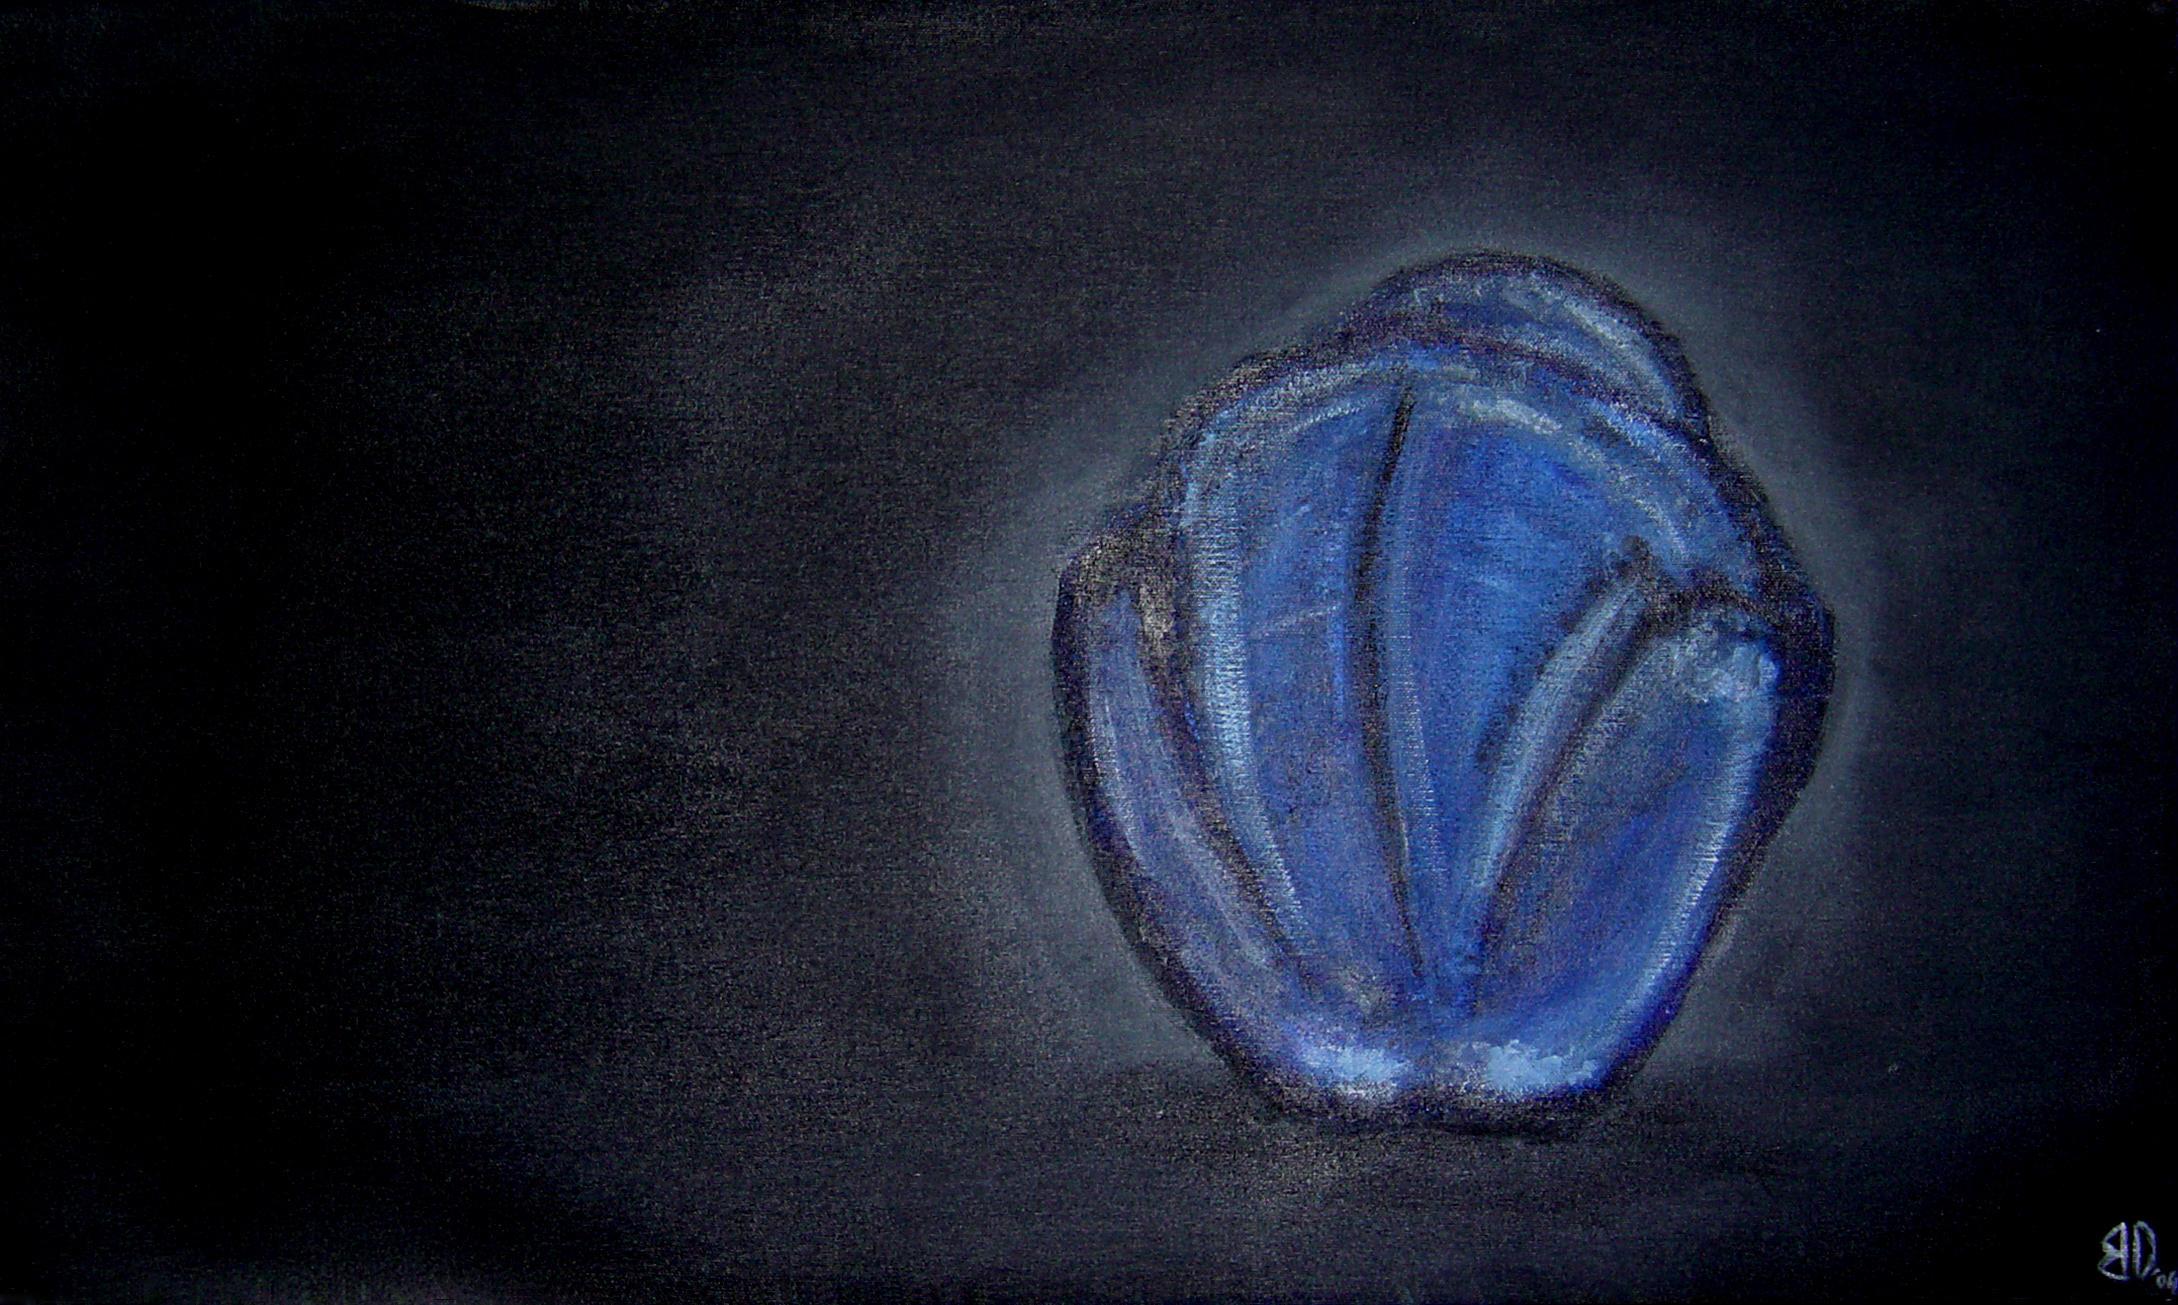 Isolation Painting by bdabov on DeviantArt Isolation Artwork